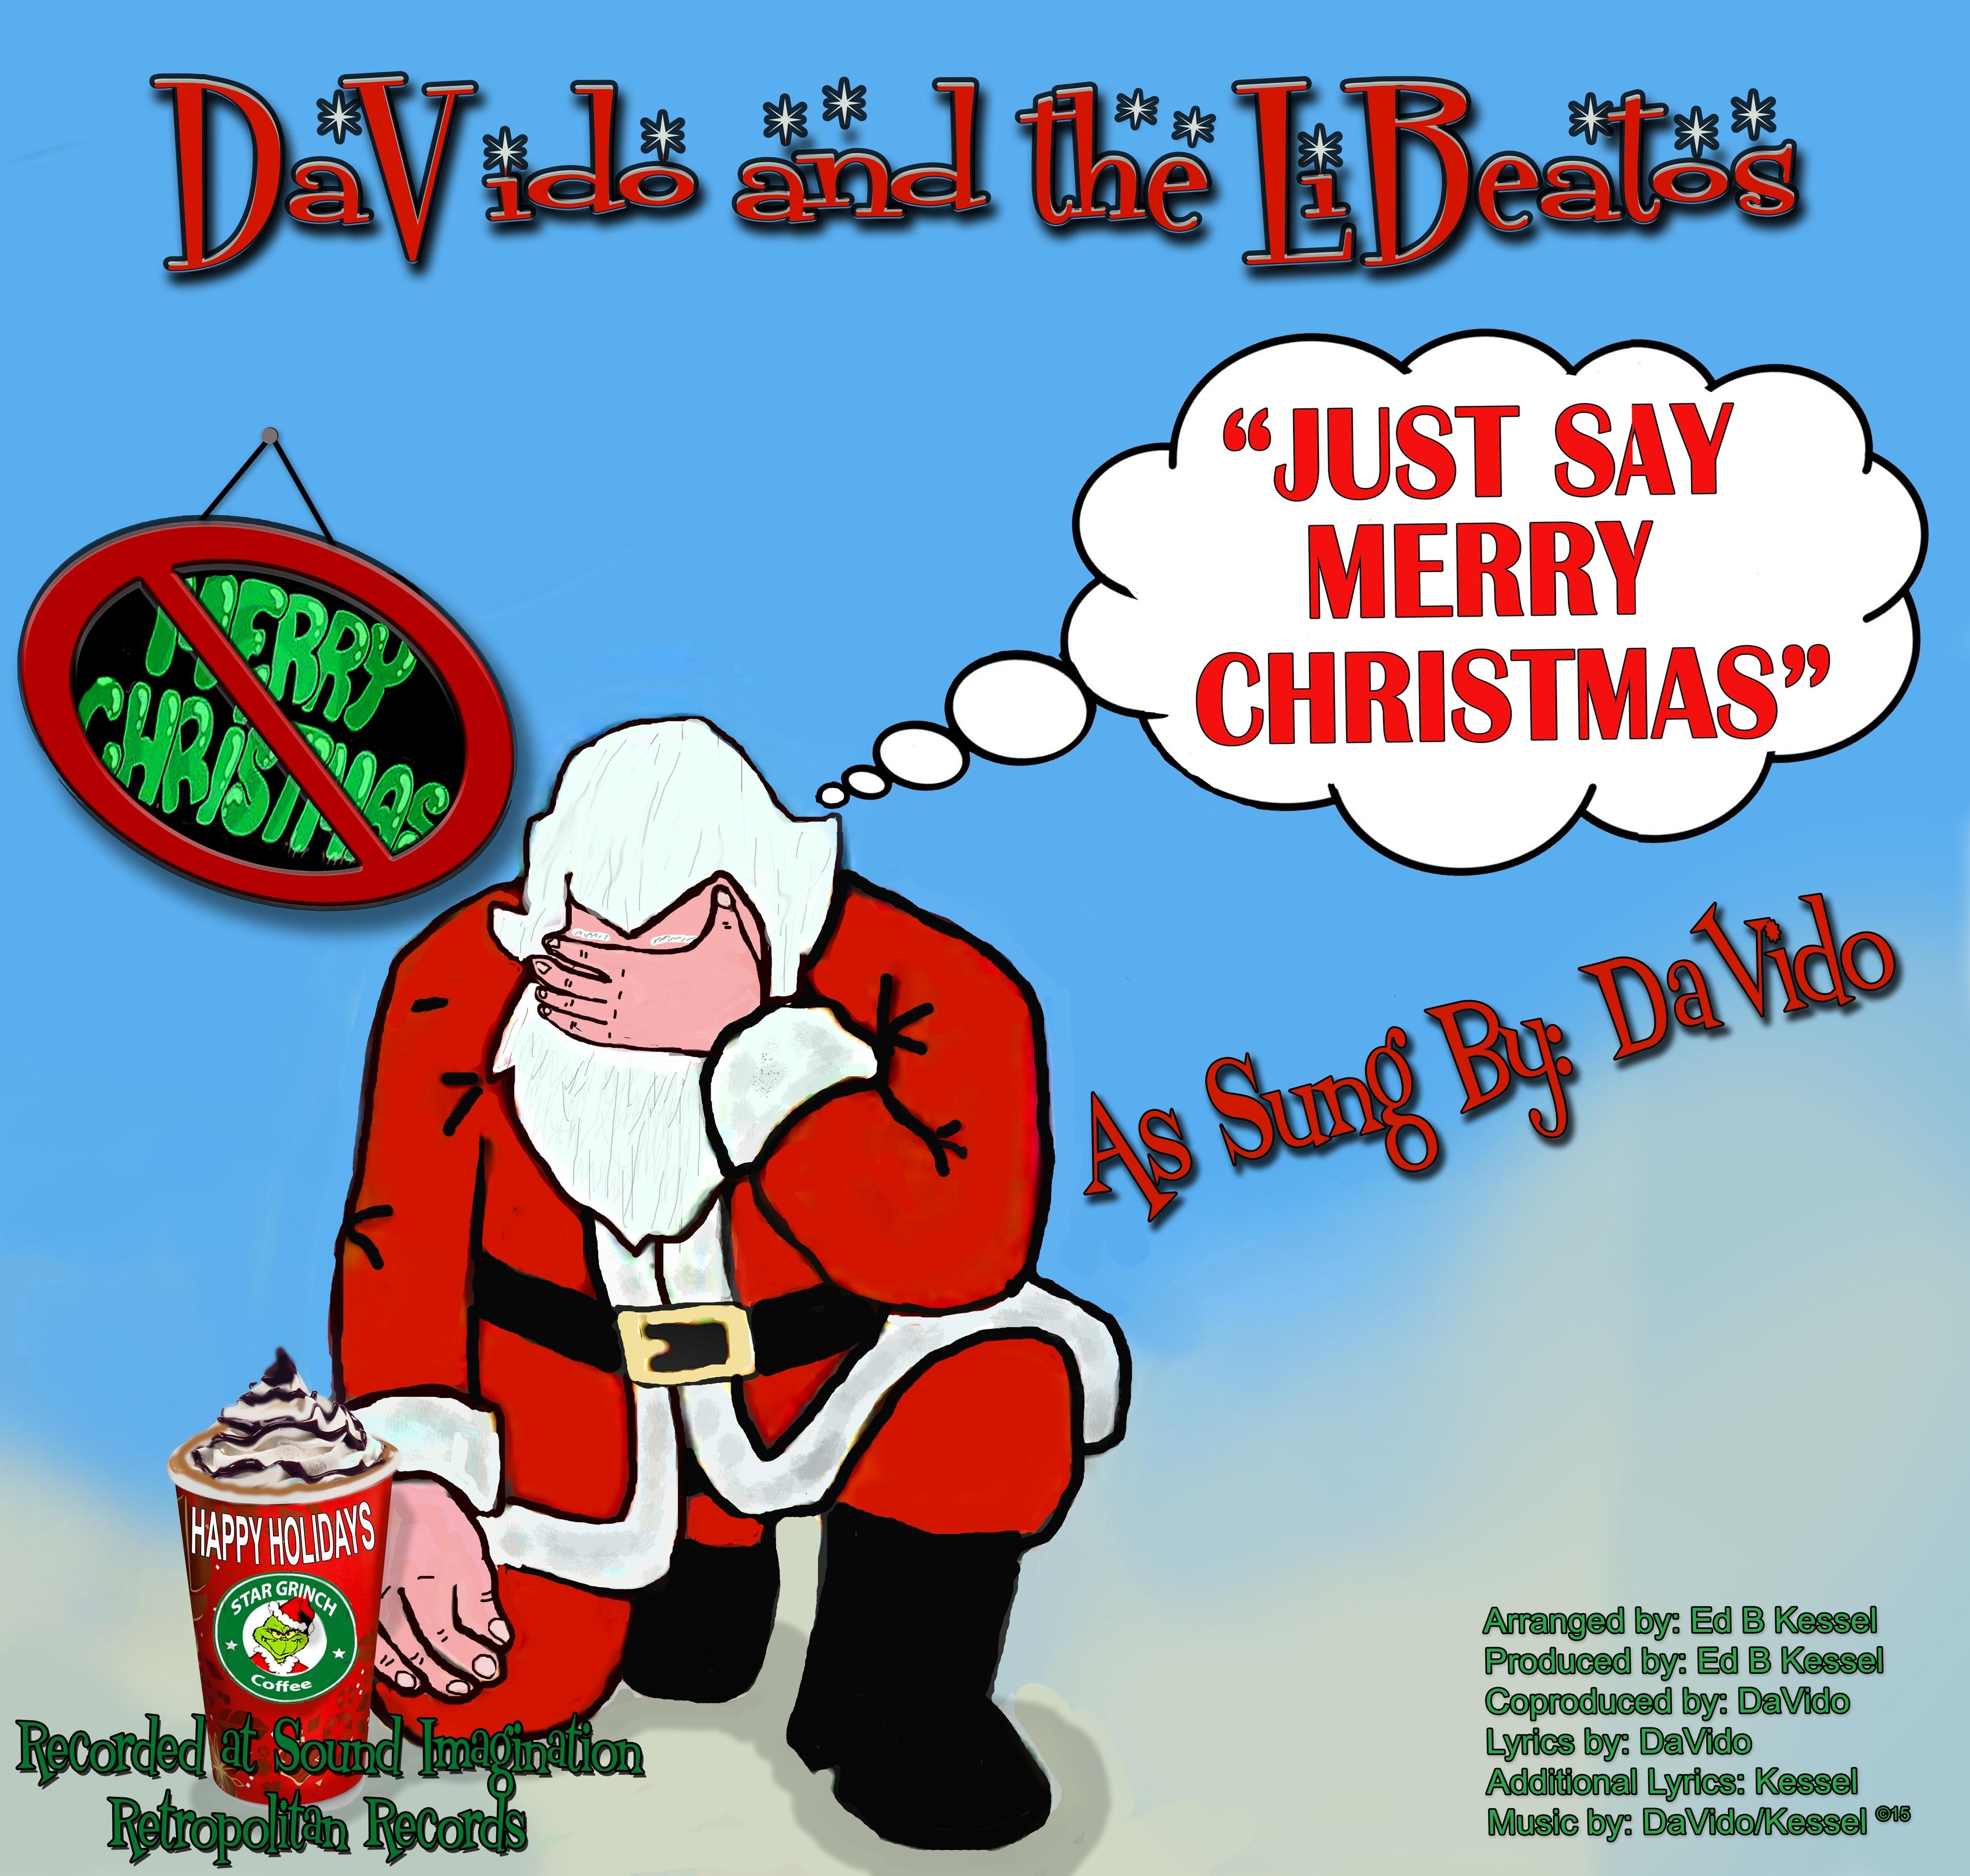 73ee01f8531d452910b4_just_say_merry_christmas.jpg